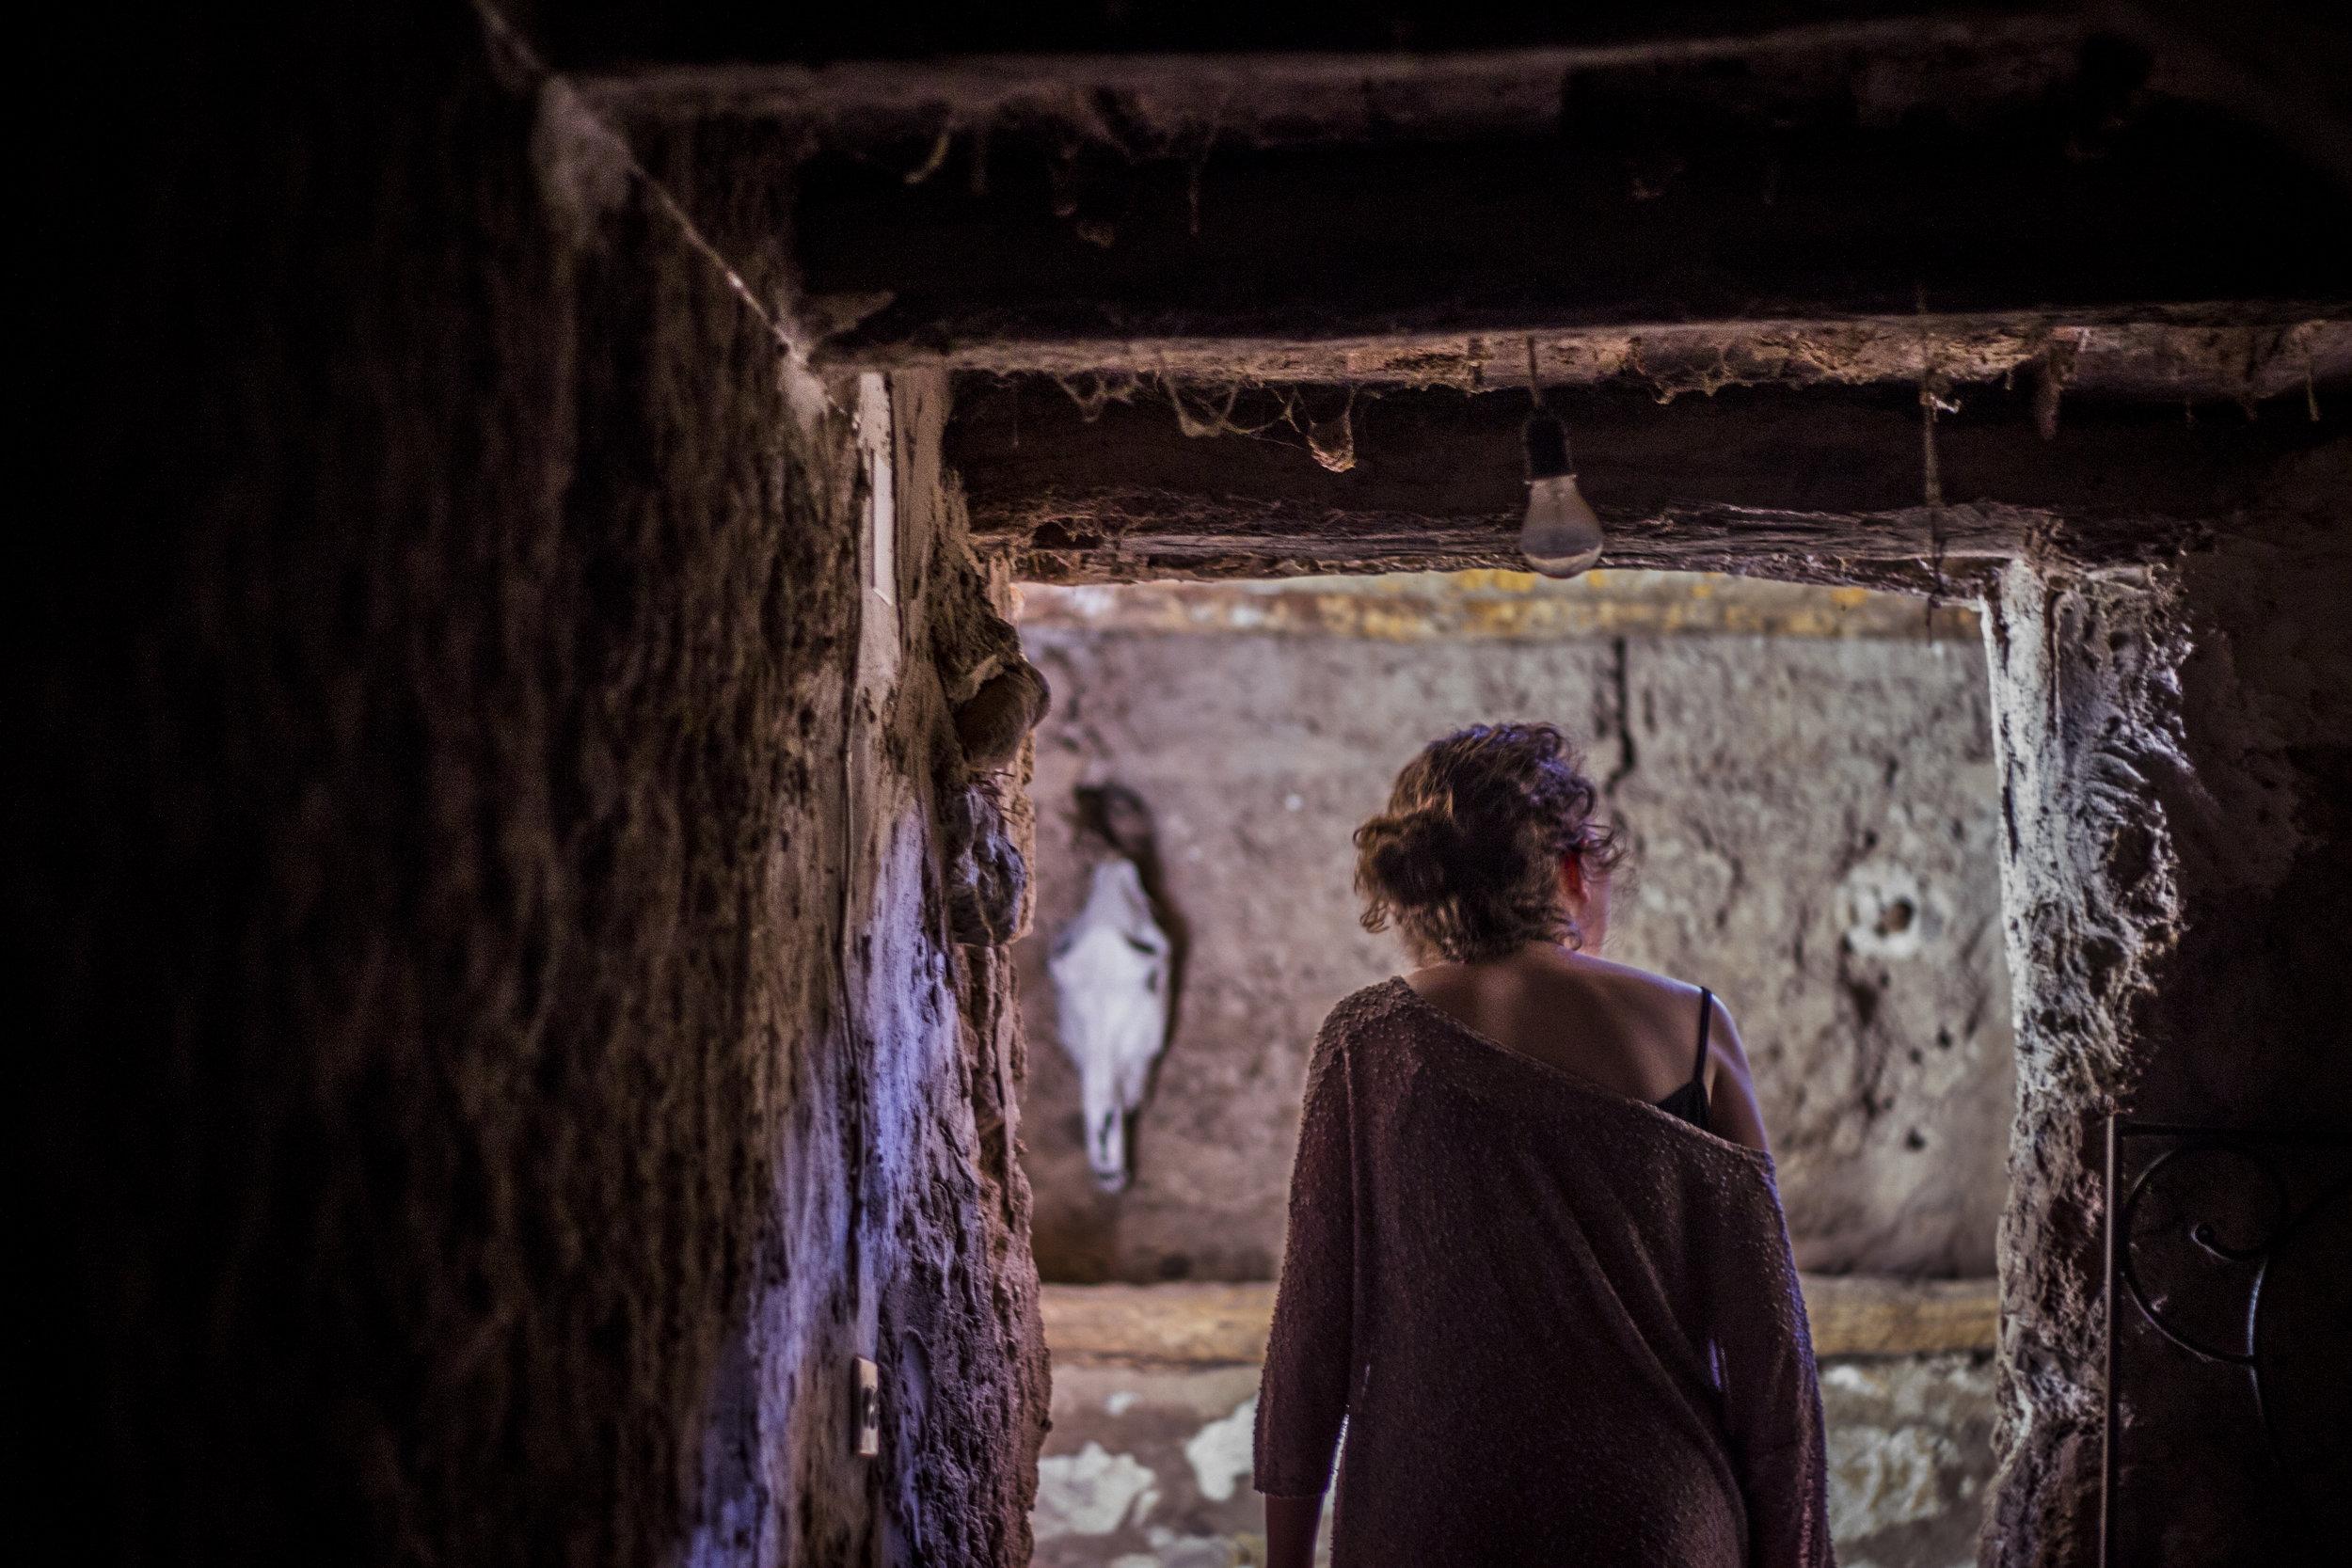 Nicoletta Favari exploring a Spanish countryside home in  Torralba de Ribota .